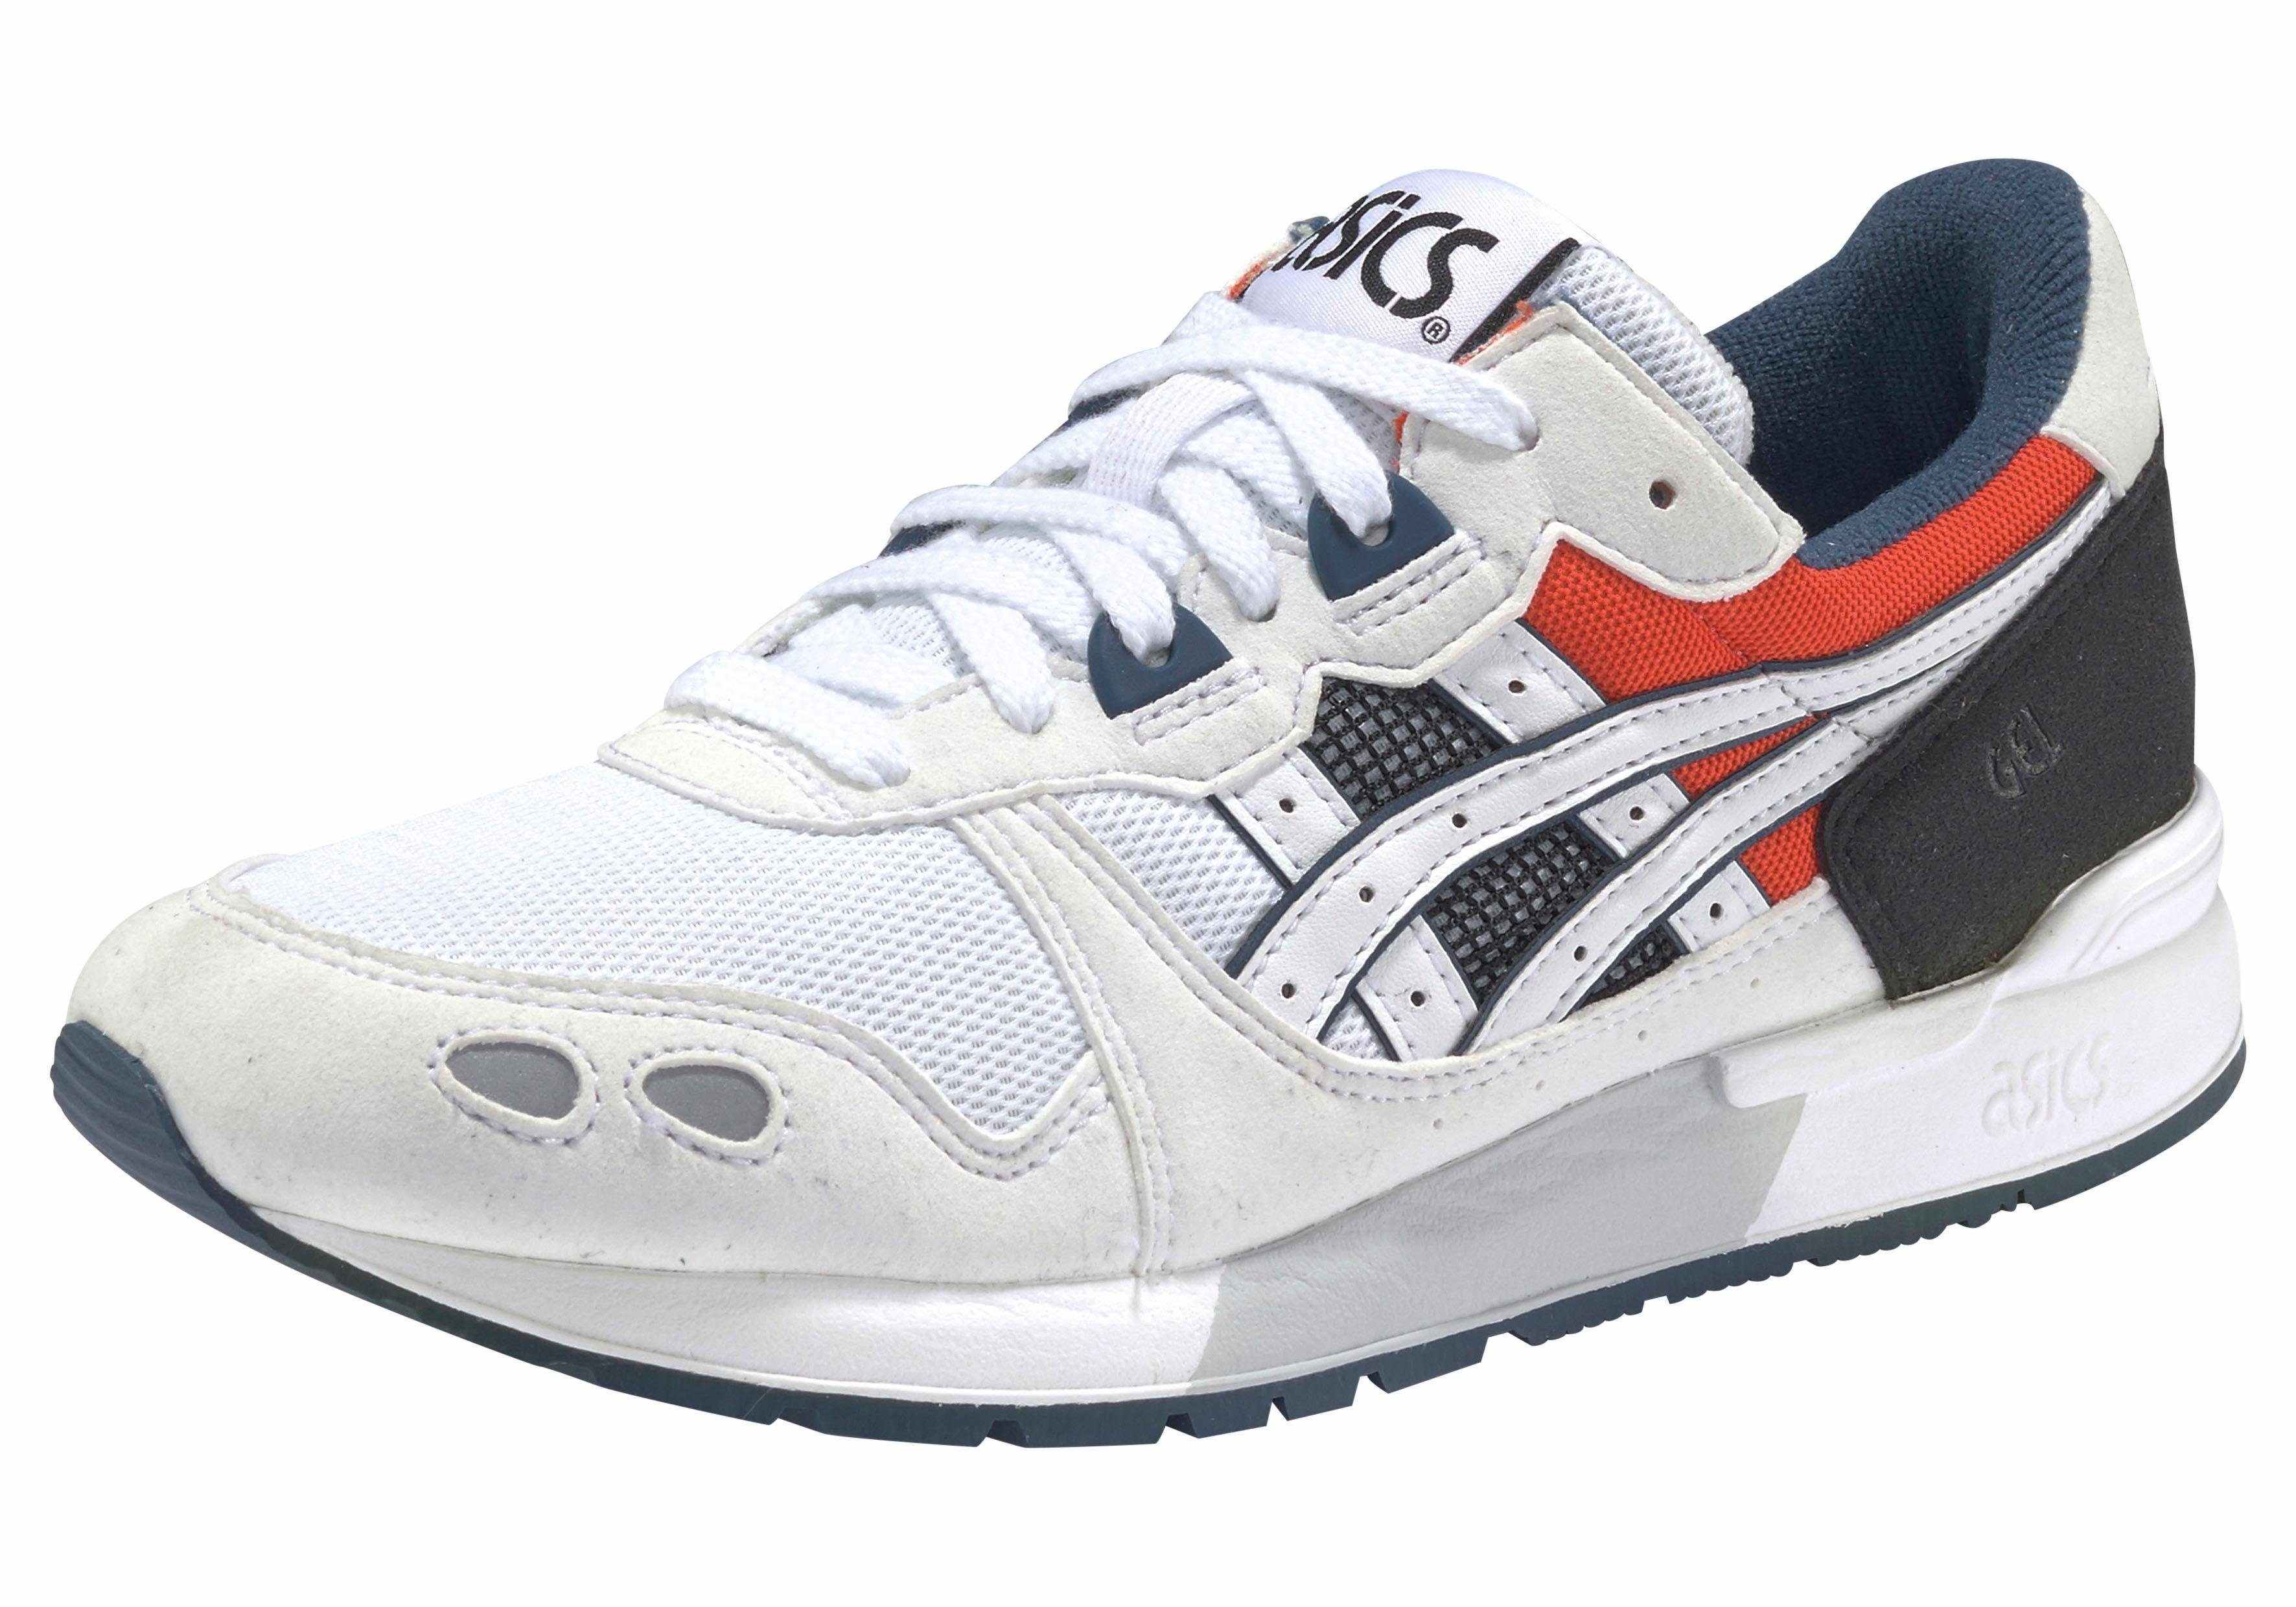 ASICS tiger »GEL-LYTE« Sneaker unisex kaufen | OTTO